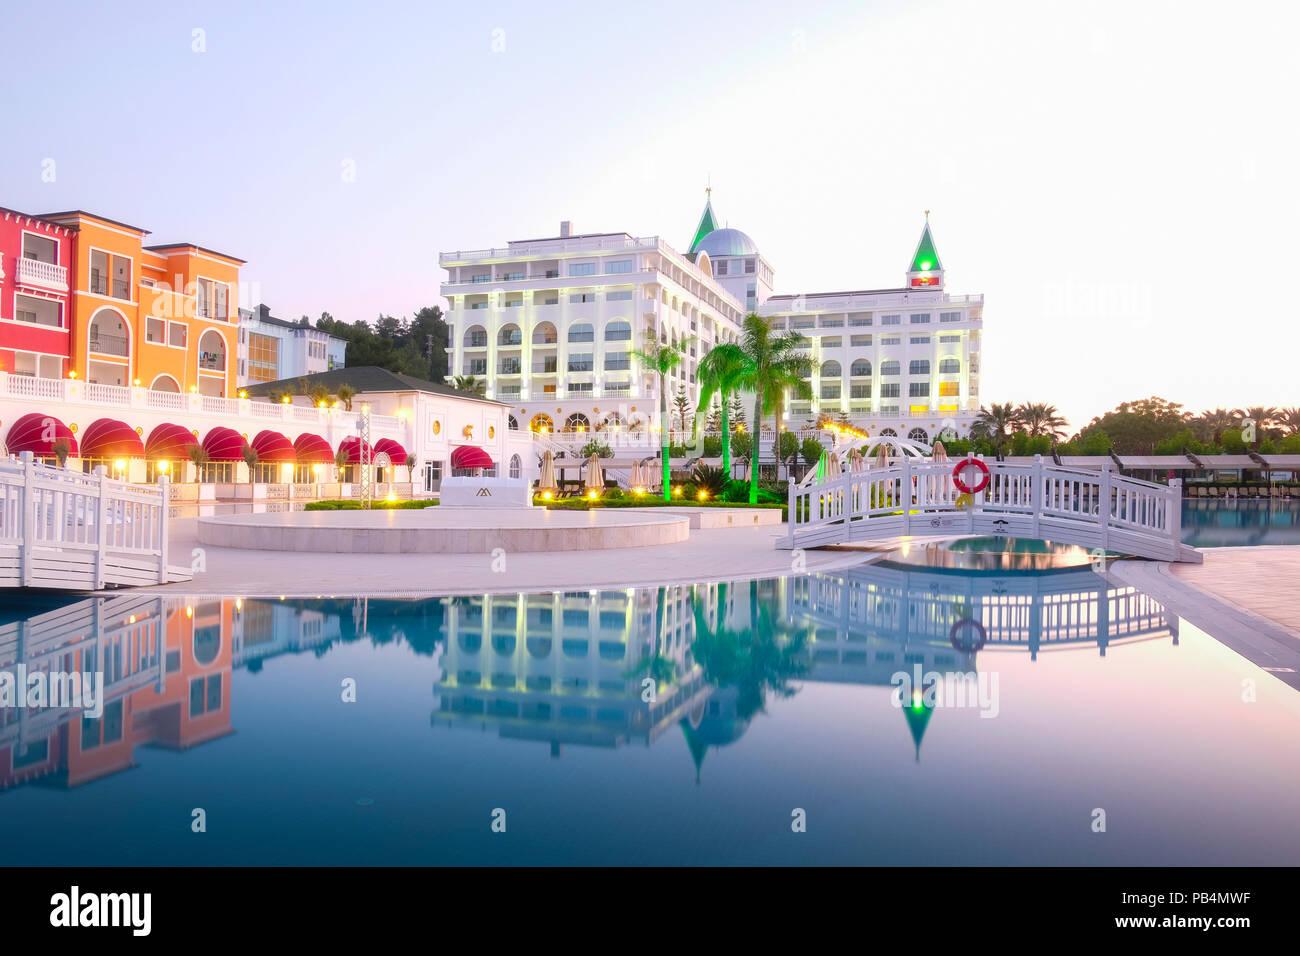 The popular resort Amara Dolce Vita Luxury Hotel - Stock Image